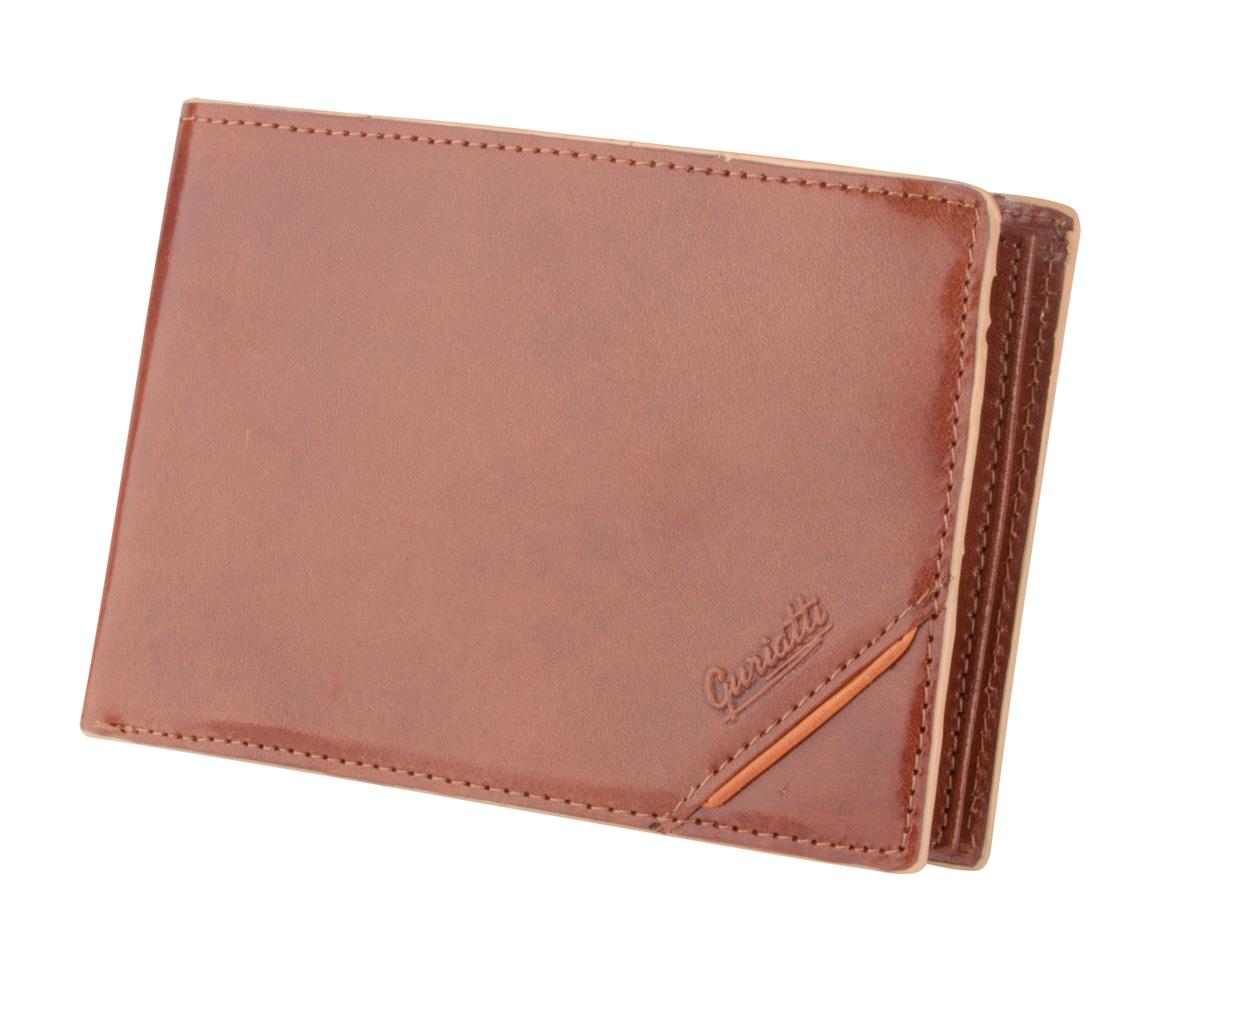 Curioso unisex wallet